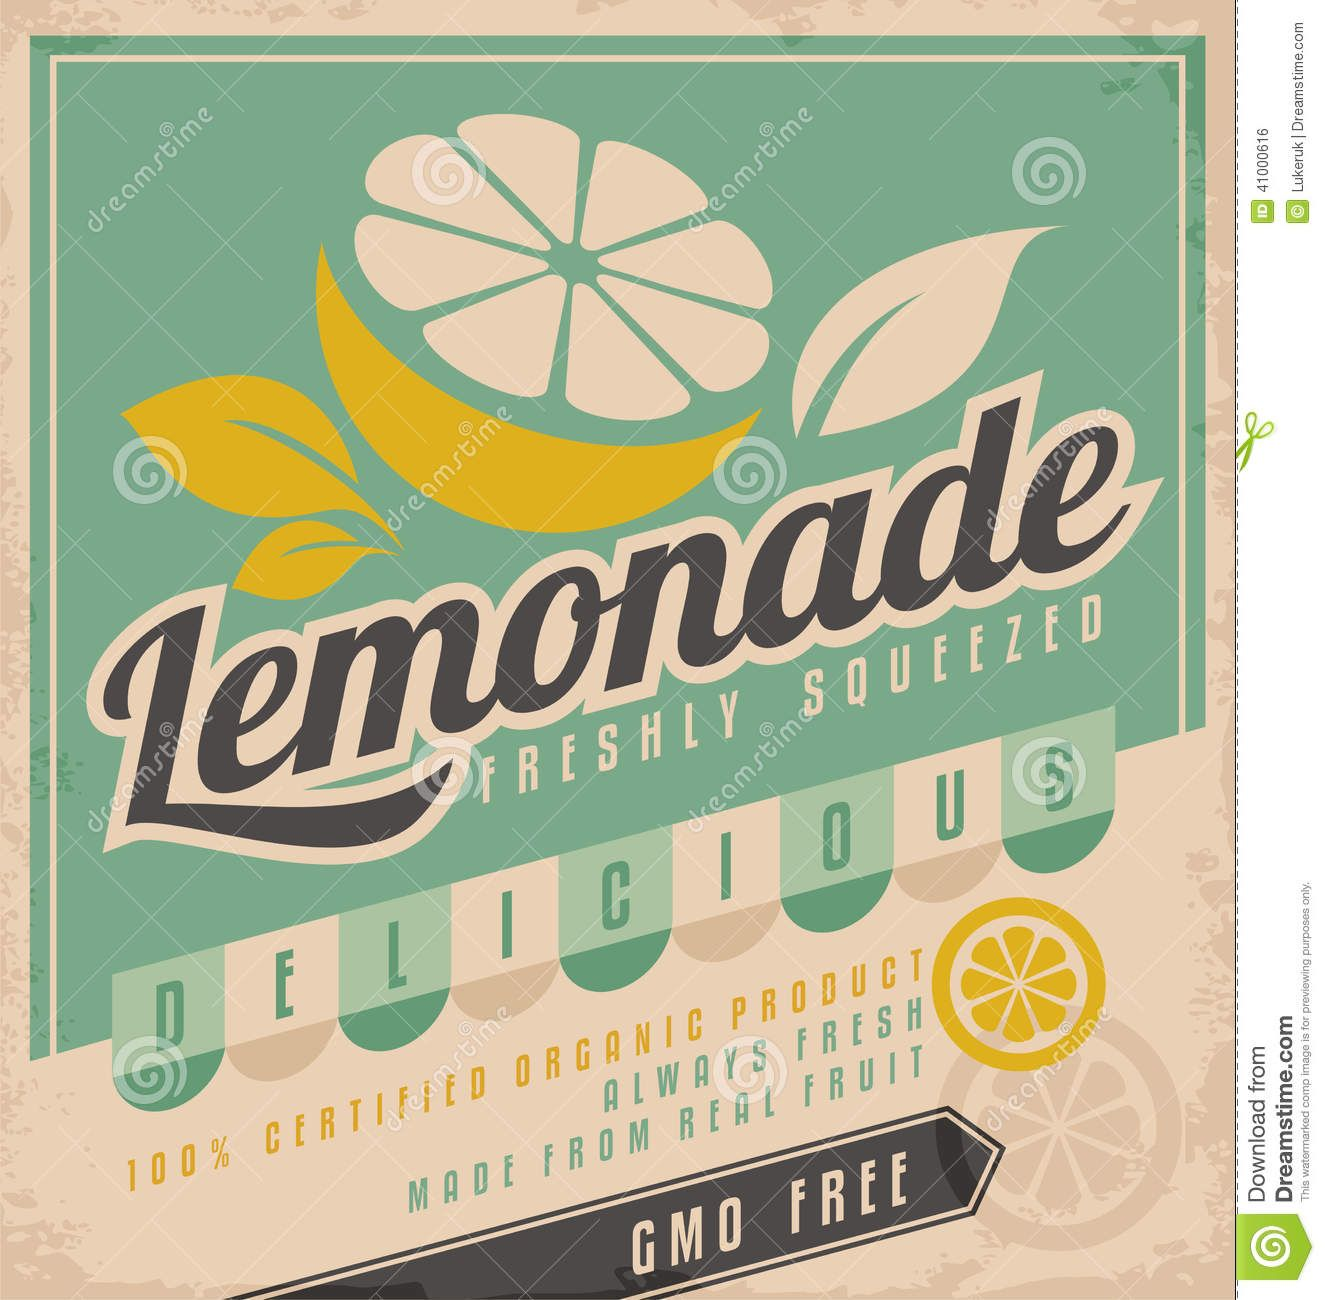 Vintage Lemonade Sign | Design Loves | Pinterest